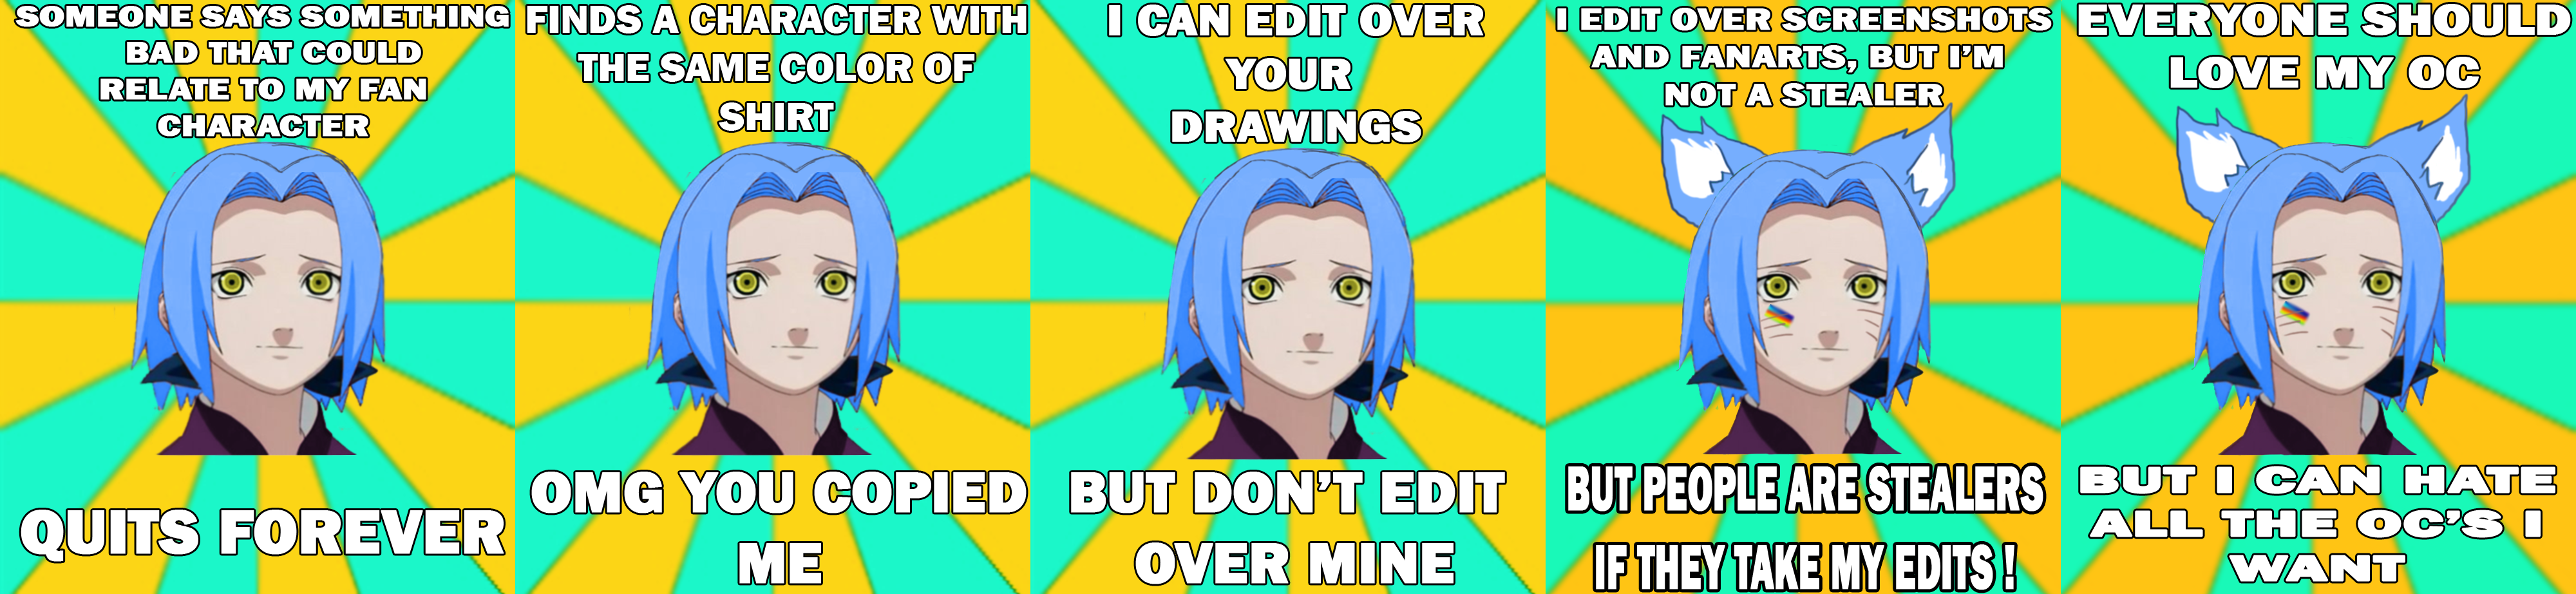 Naruto OC memes by anniberri